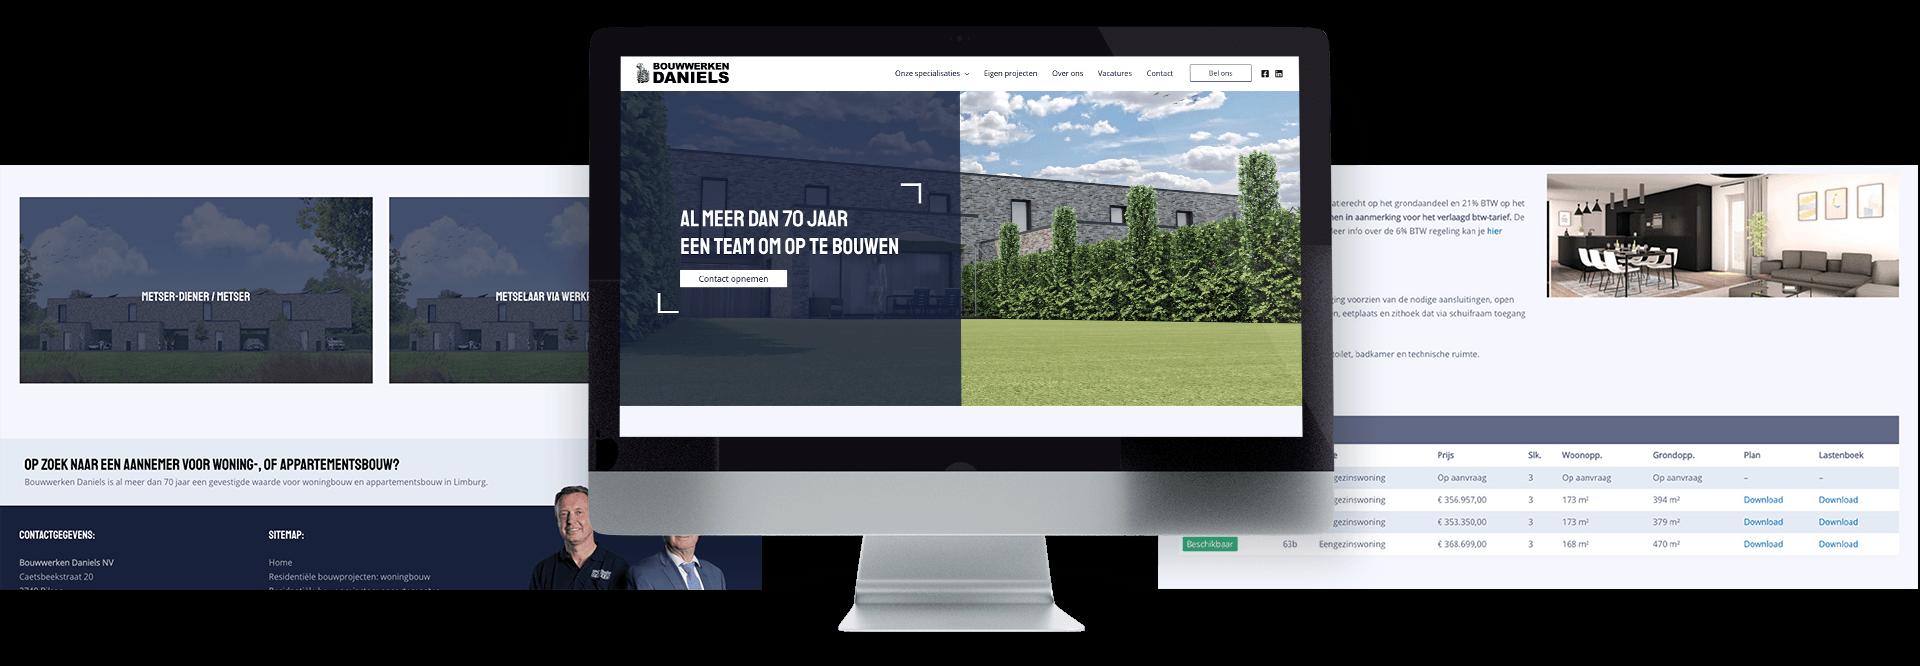 Website van bouwbedrijf Bouwwerken Daniels